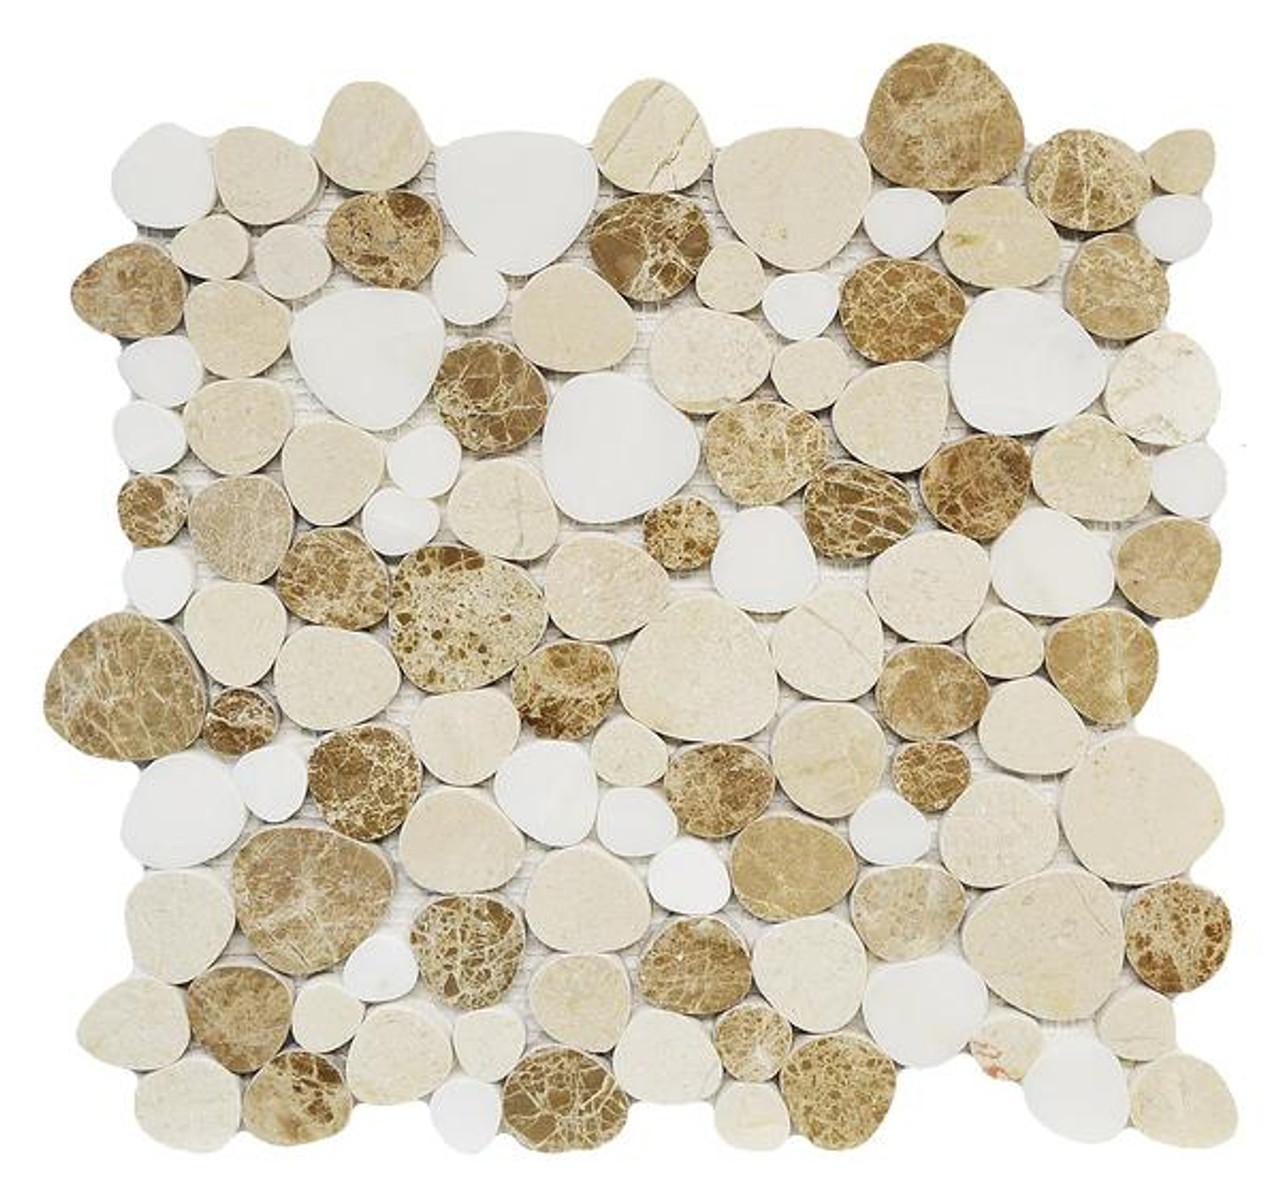 marmol light emperador white jade crema marfil mosaic